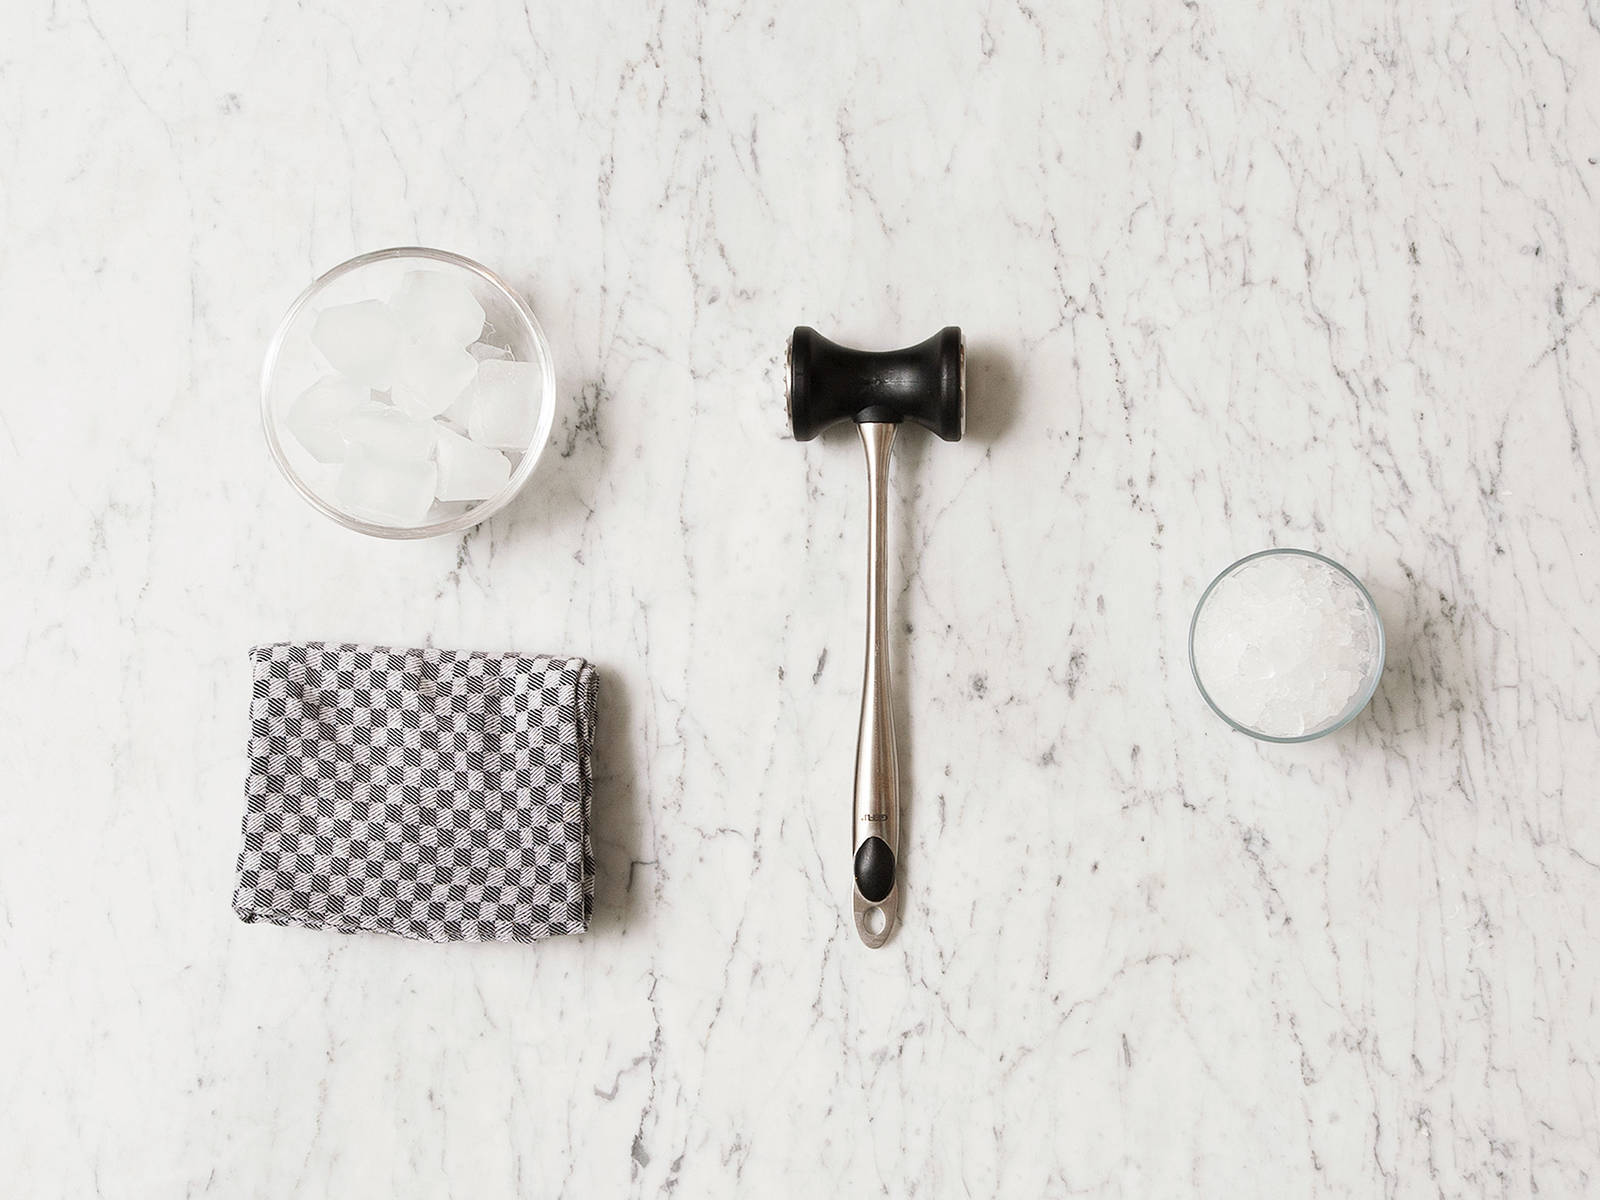 crushed ice selber machen rezept mit video kitchen stories. Black Bedroom Furniture Sets. Home Design Ideas